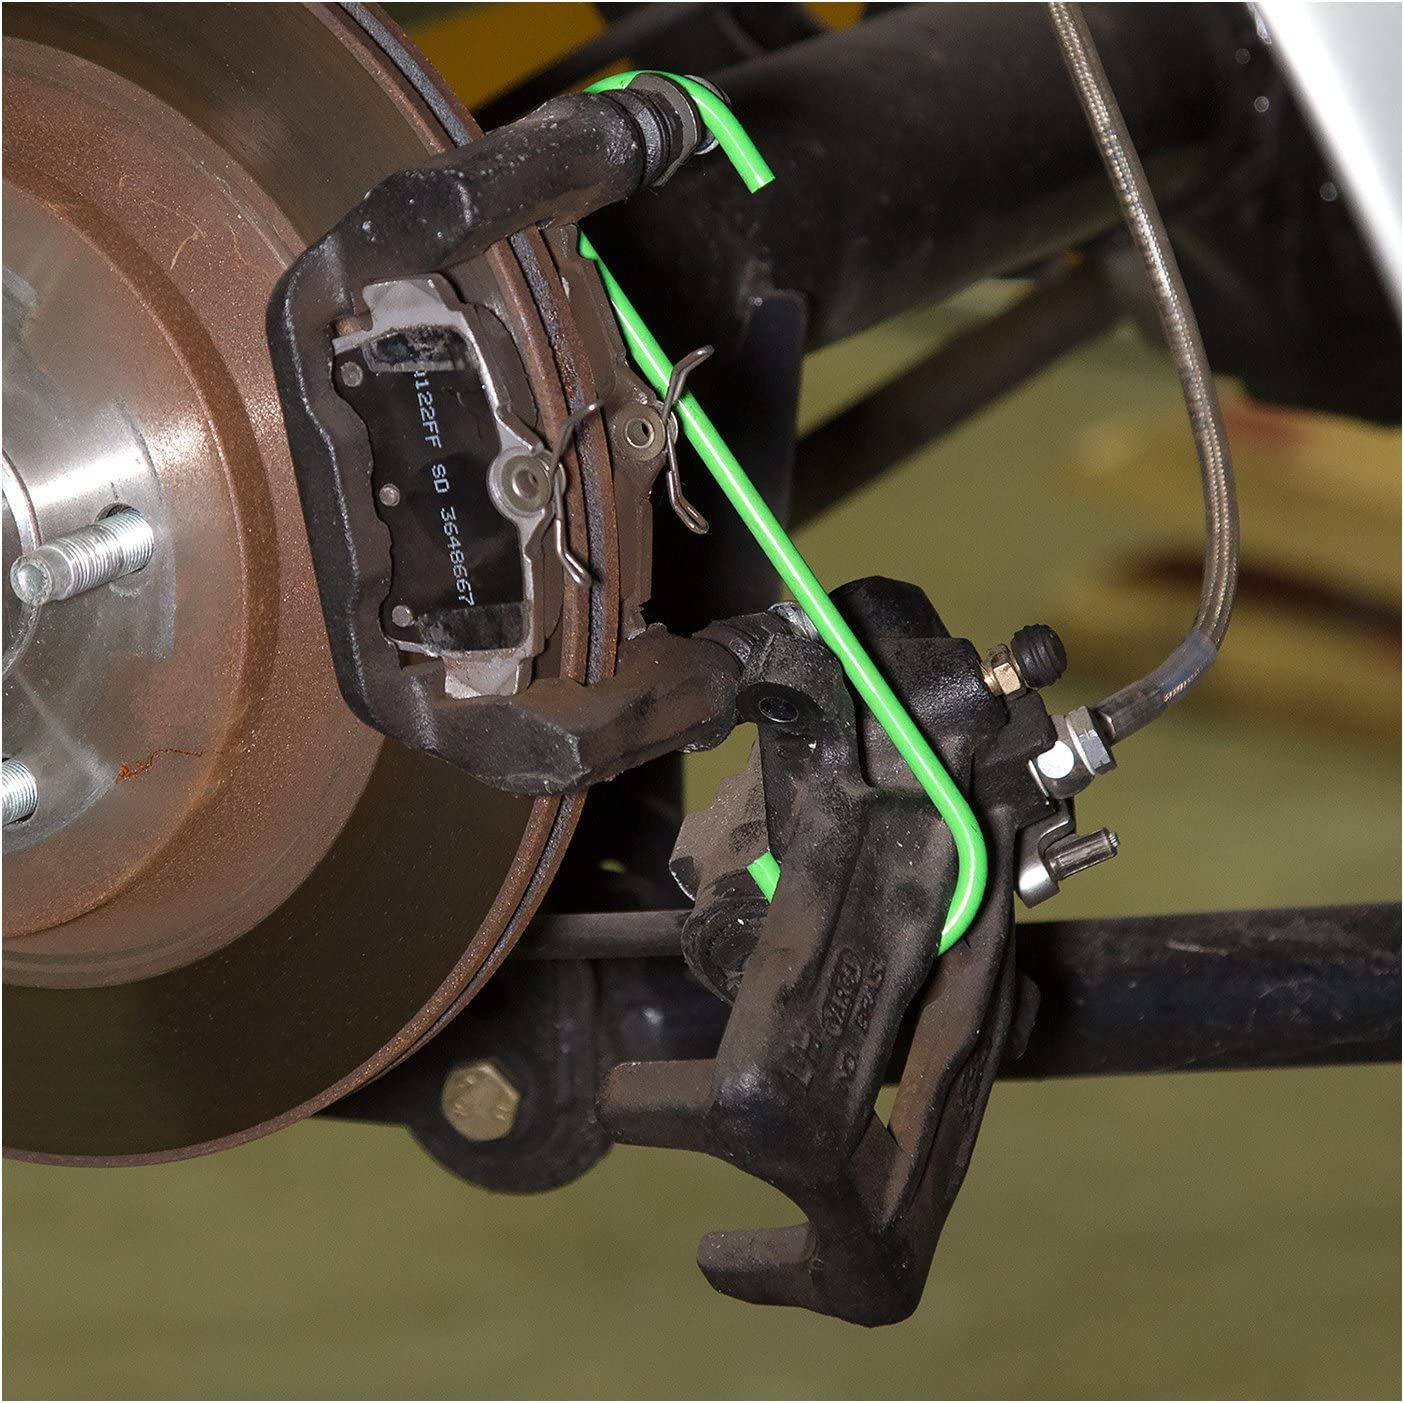 ALAVENTE 2 Pcs Jeep Door Limiting Straps Heavy Duty Swing Limiter Restrictor Straps for JK YJ TJ CJ 1996-2017 Red